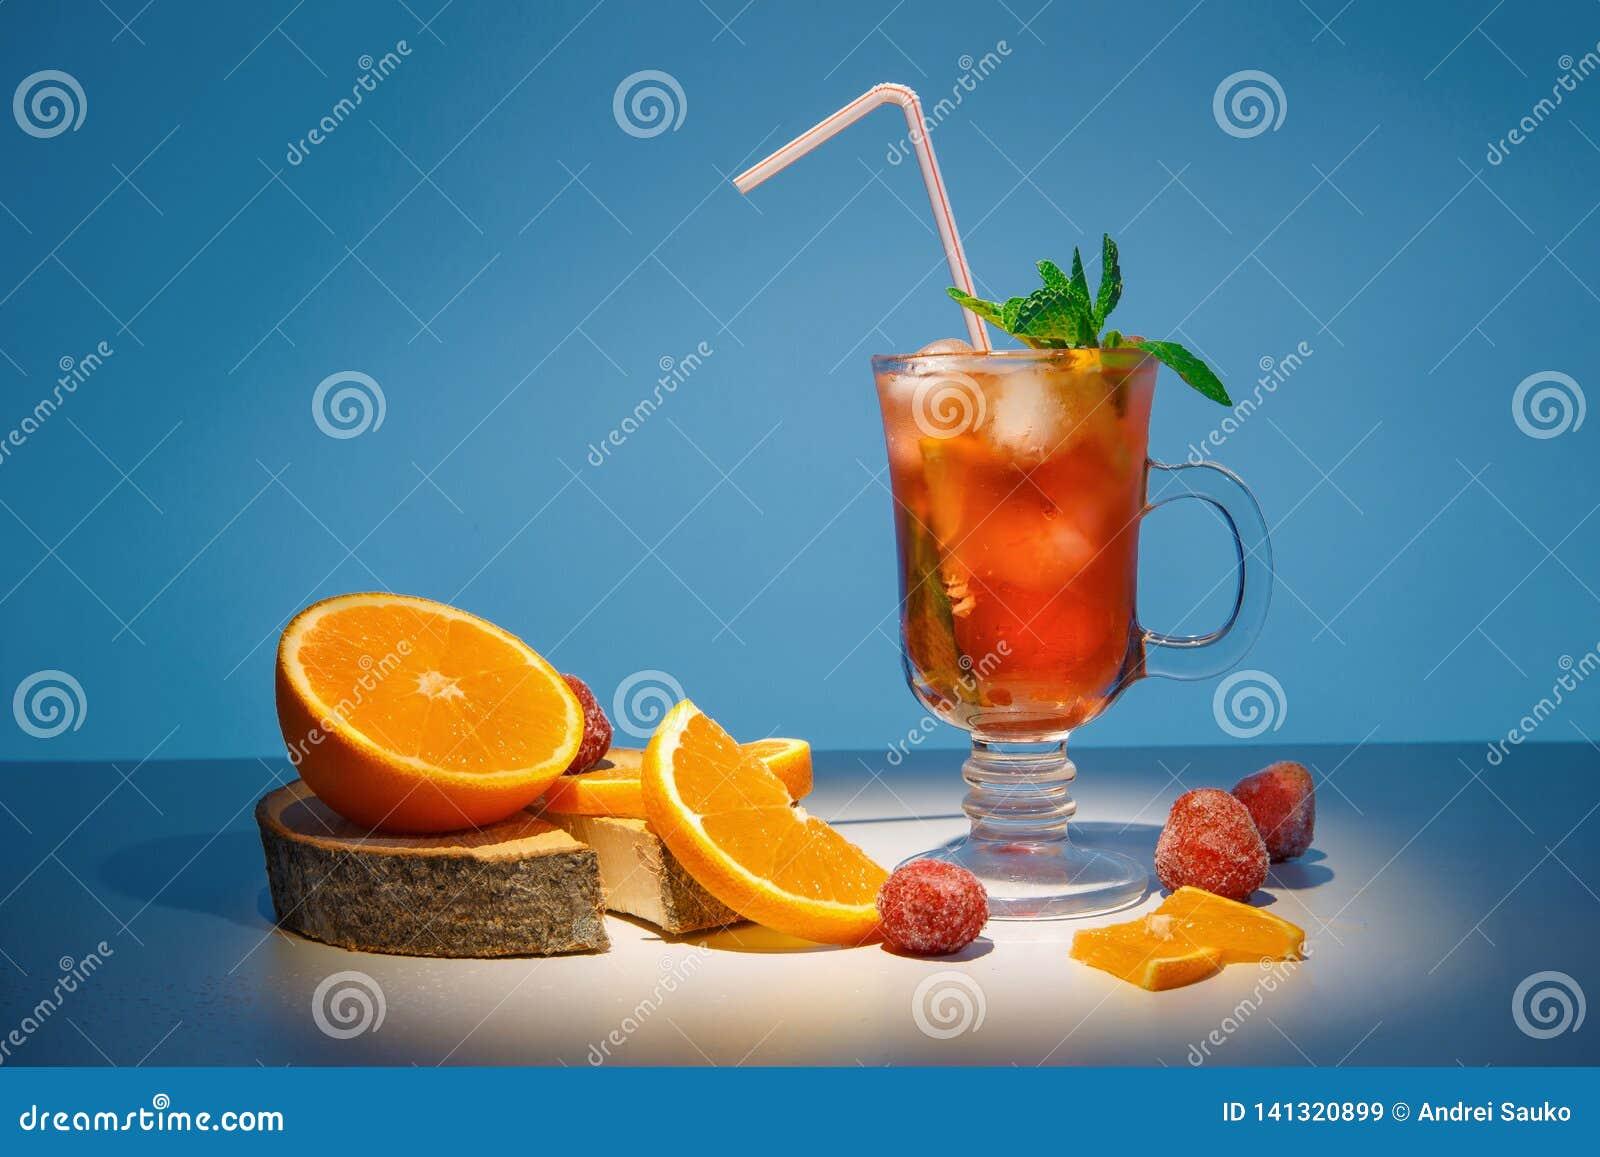 Spring orange cocktail. Tropical cocktail